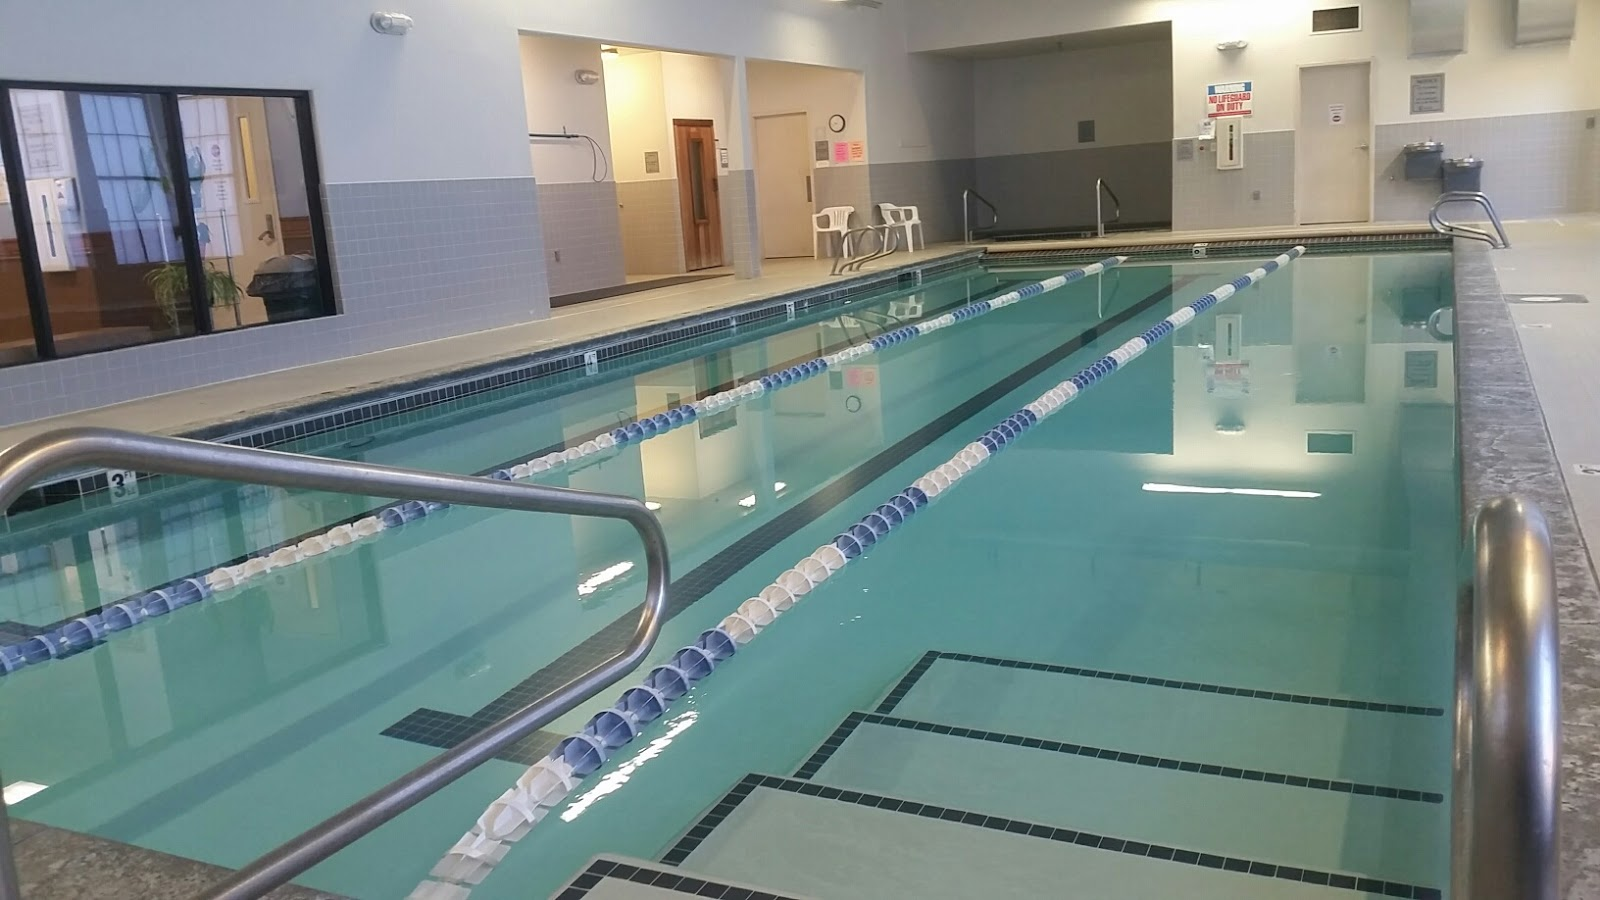 The club mccall swimming - Club mahindra kandaghat swimming pool ...